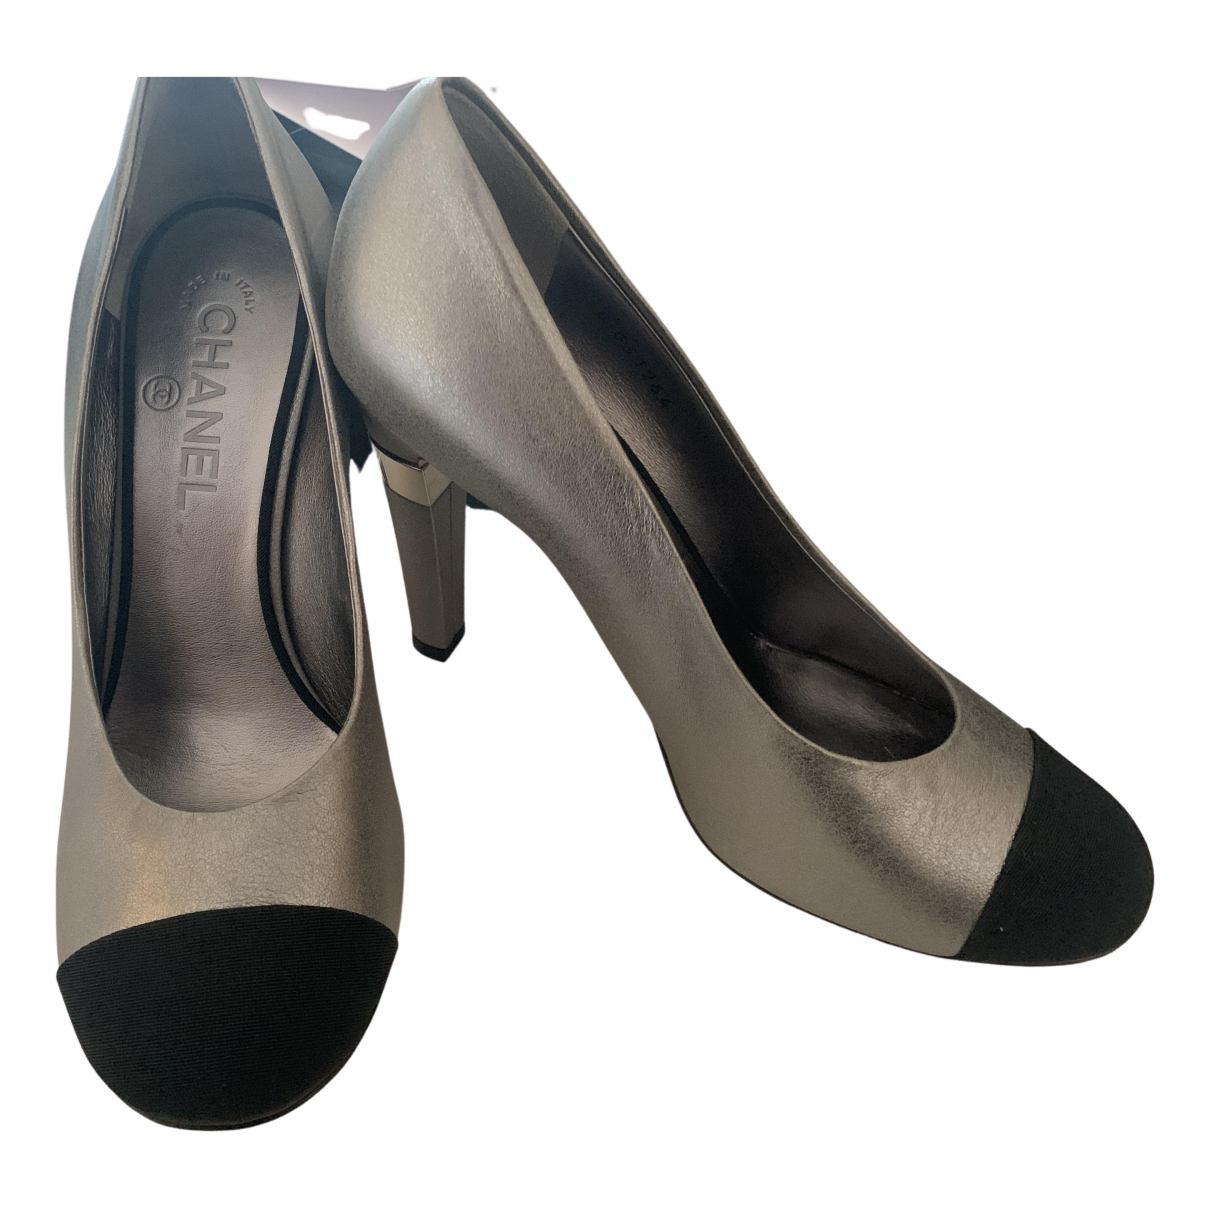 Chanel \N Silver Leather Heels for Women 38.5 EU